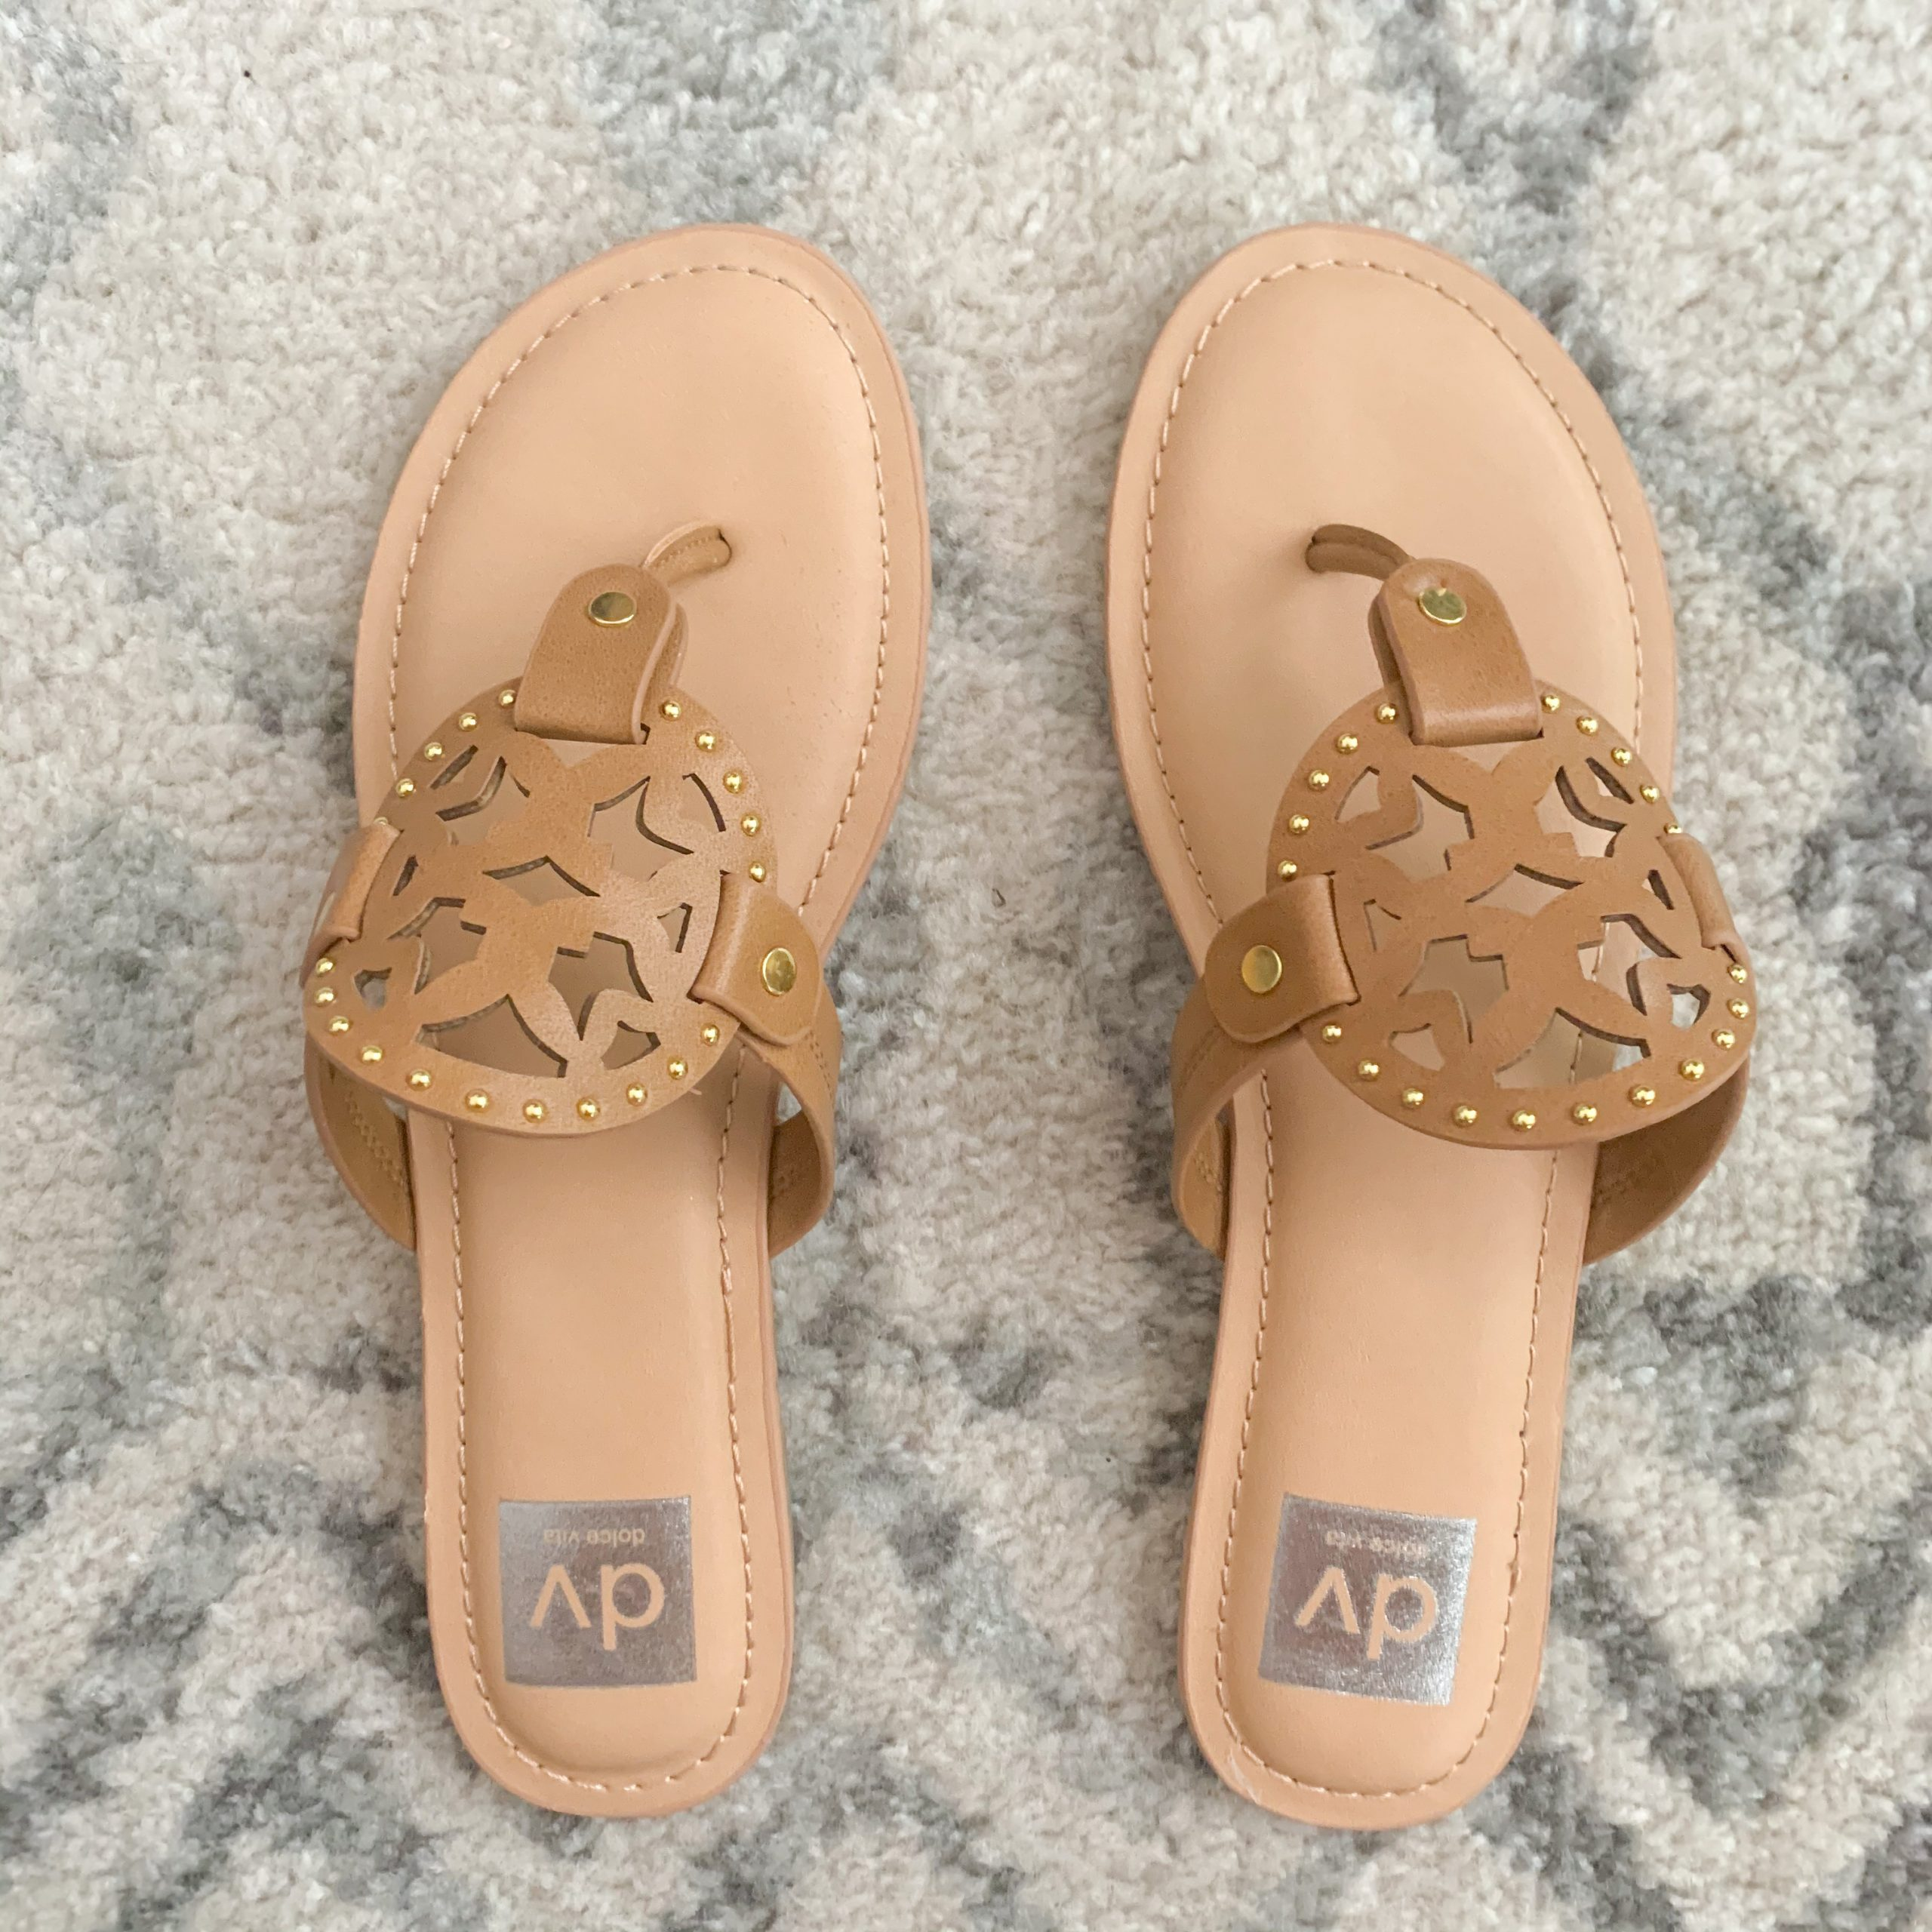 Beach vacation capsule wardrobe- tan sandals